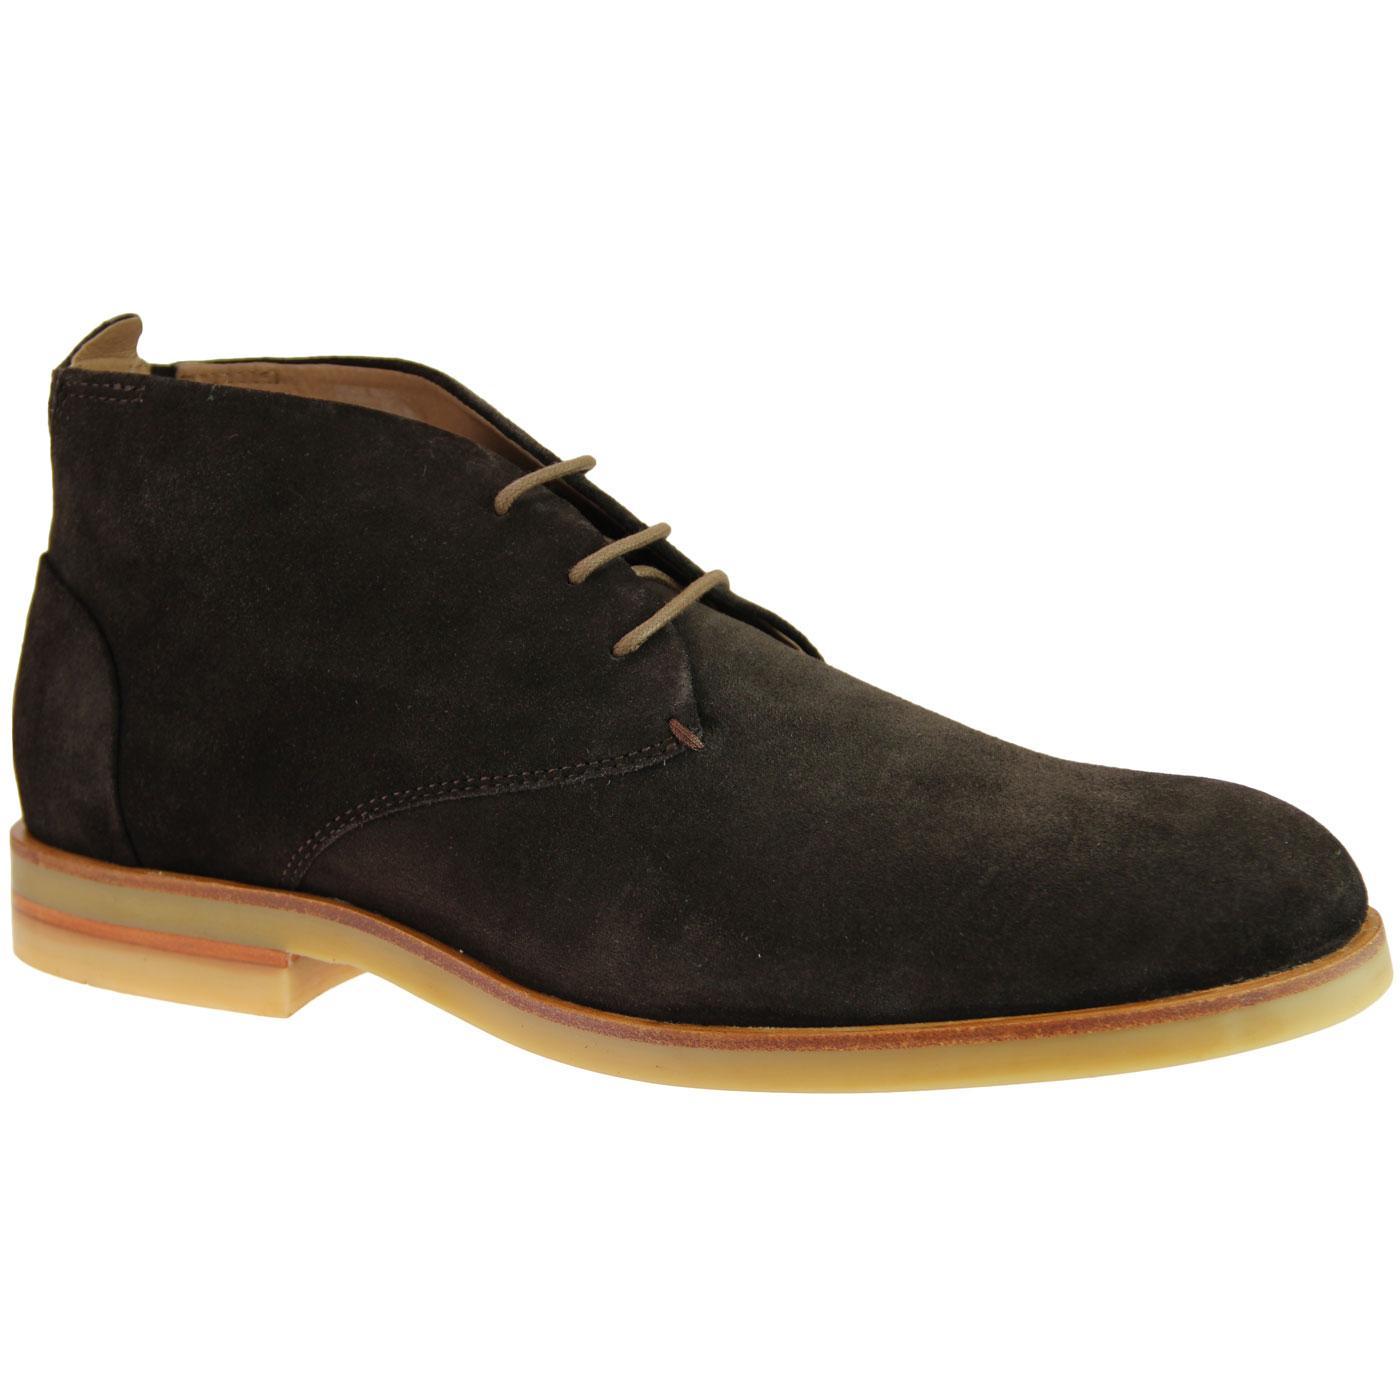 Bedlington HUDSON 60s Mod Suede Desert Boots BROWN